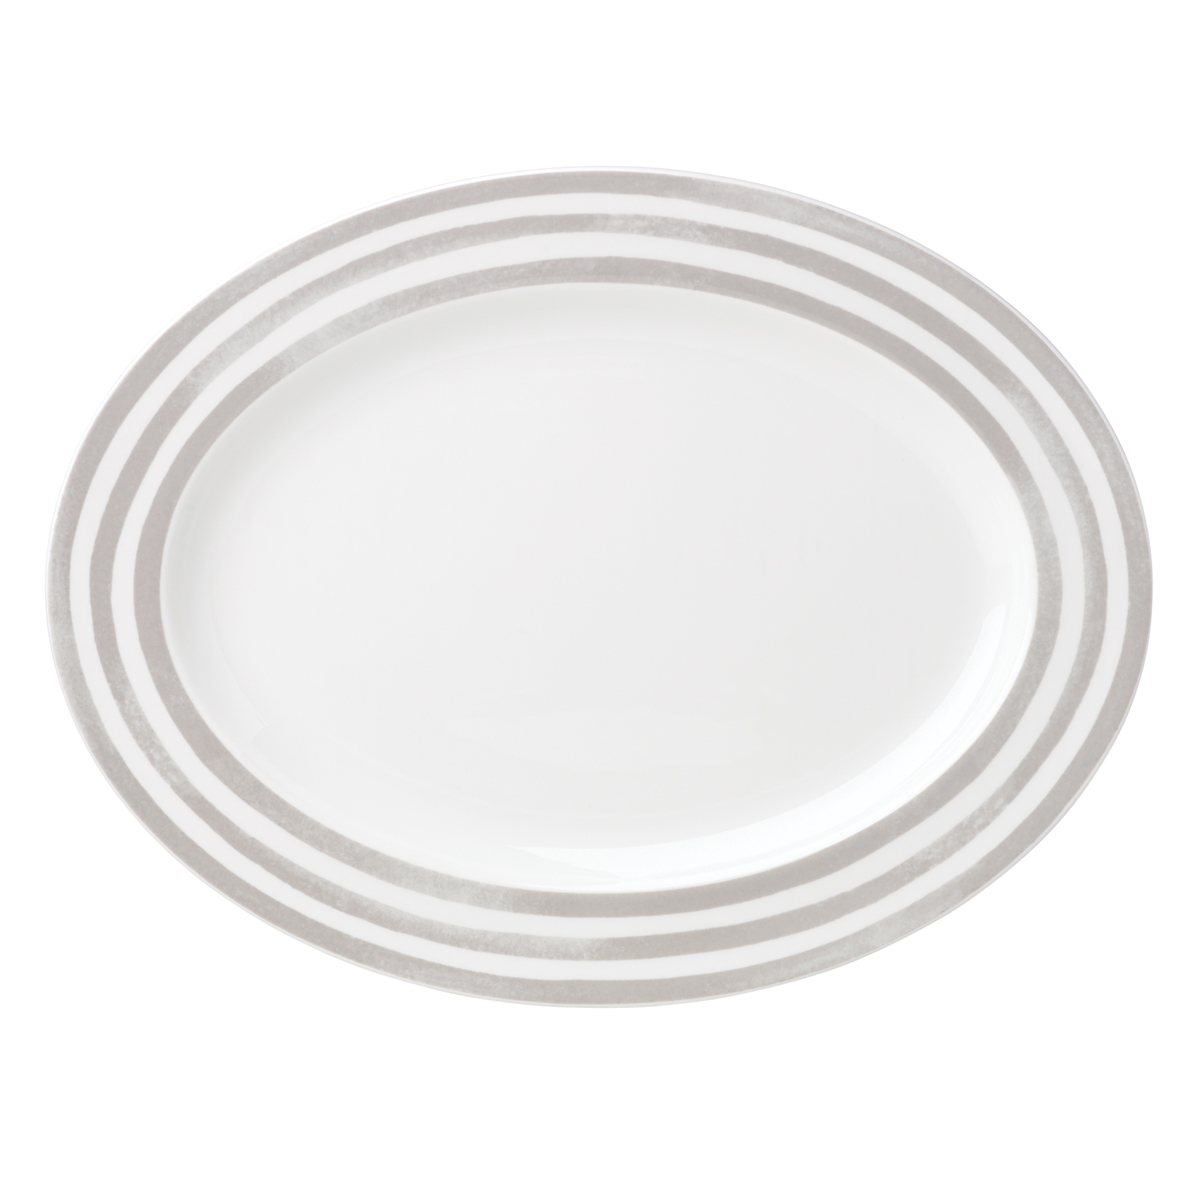 Kate Spade China by Lenox, Charlotte St Grey Oval Platter 16